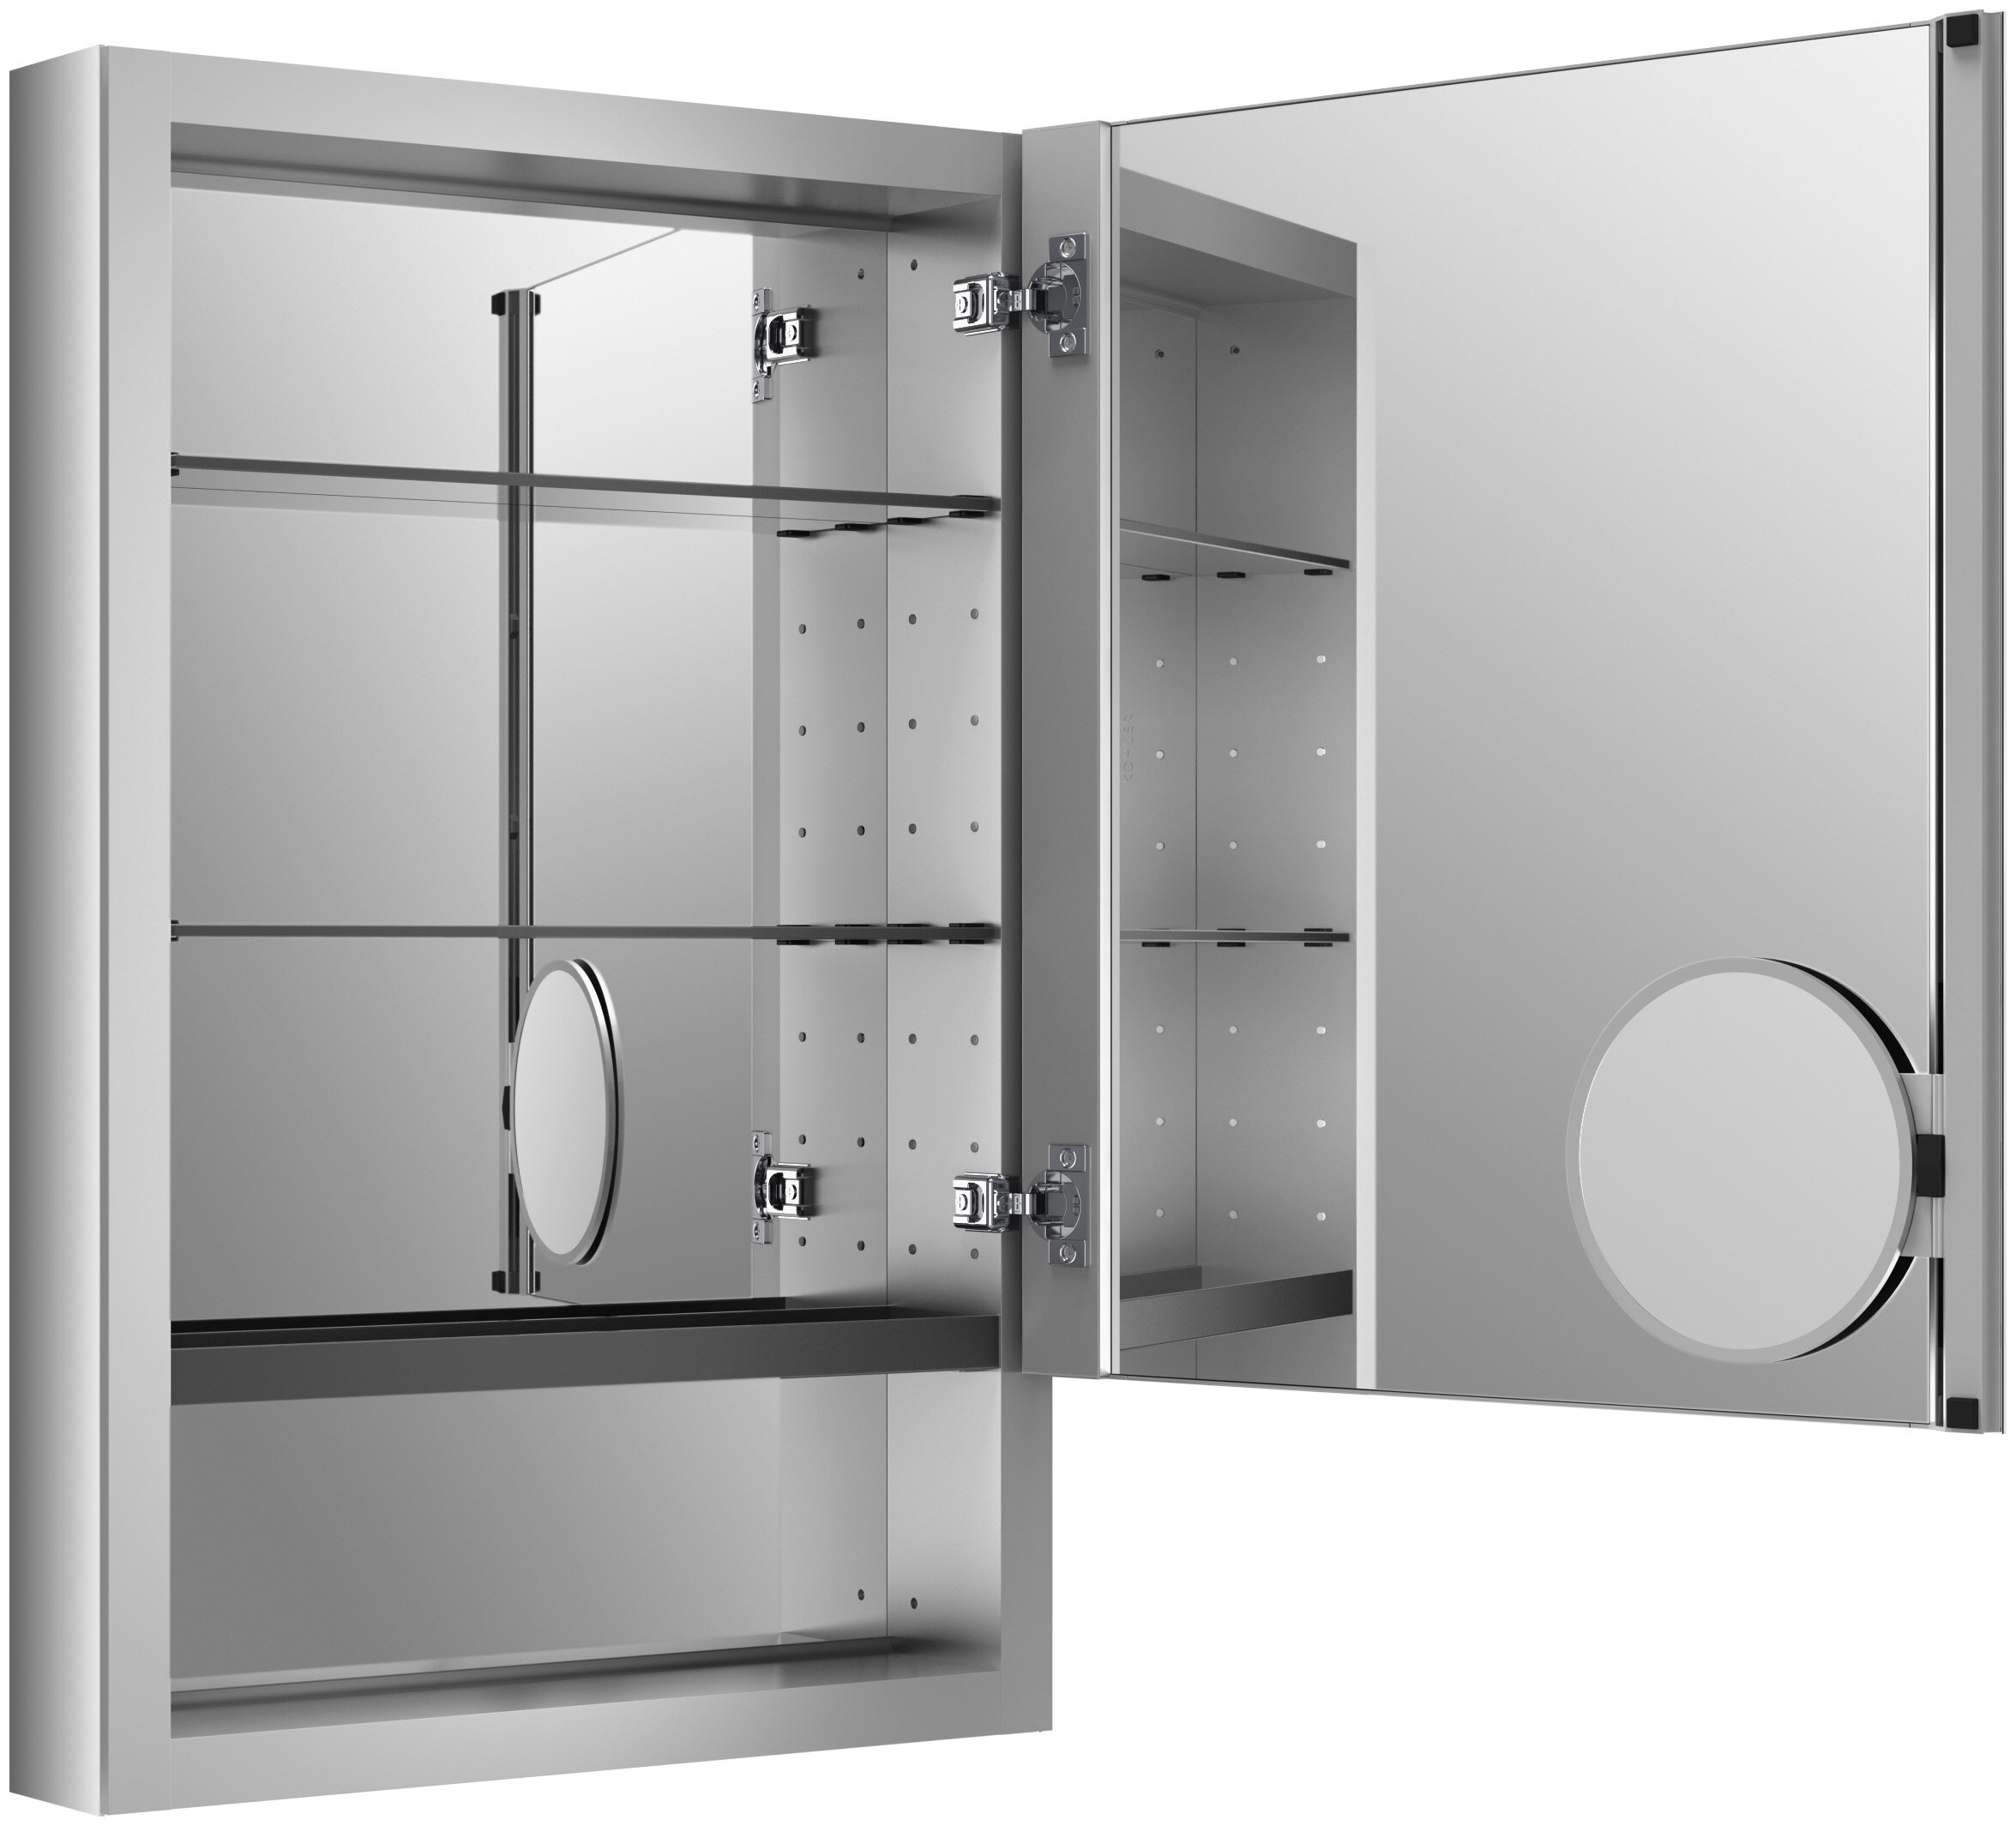 Kohler Verdera 20 X 30 Aluminum Medicine Cabinet With Adjustable